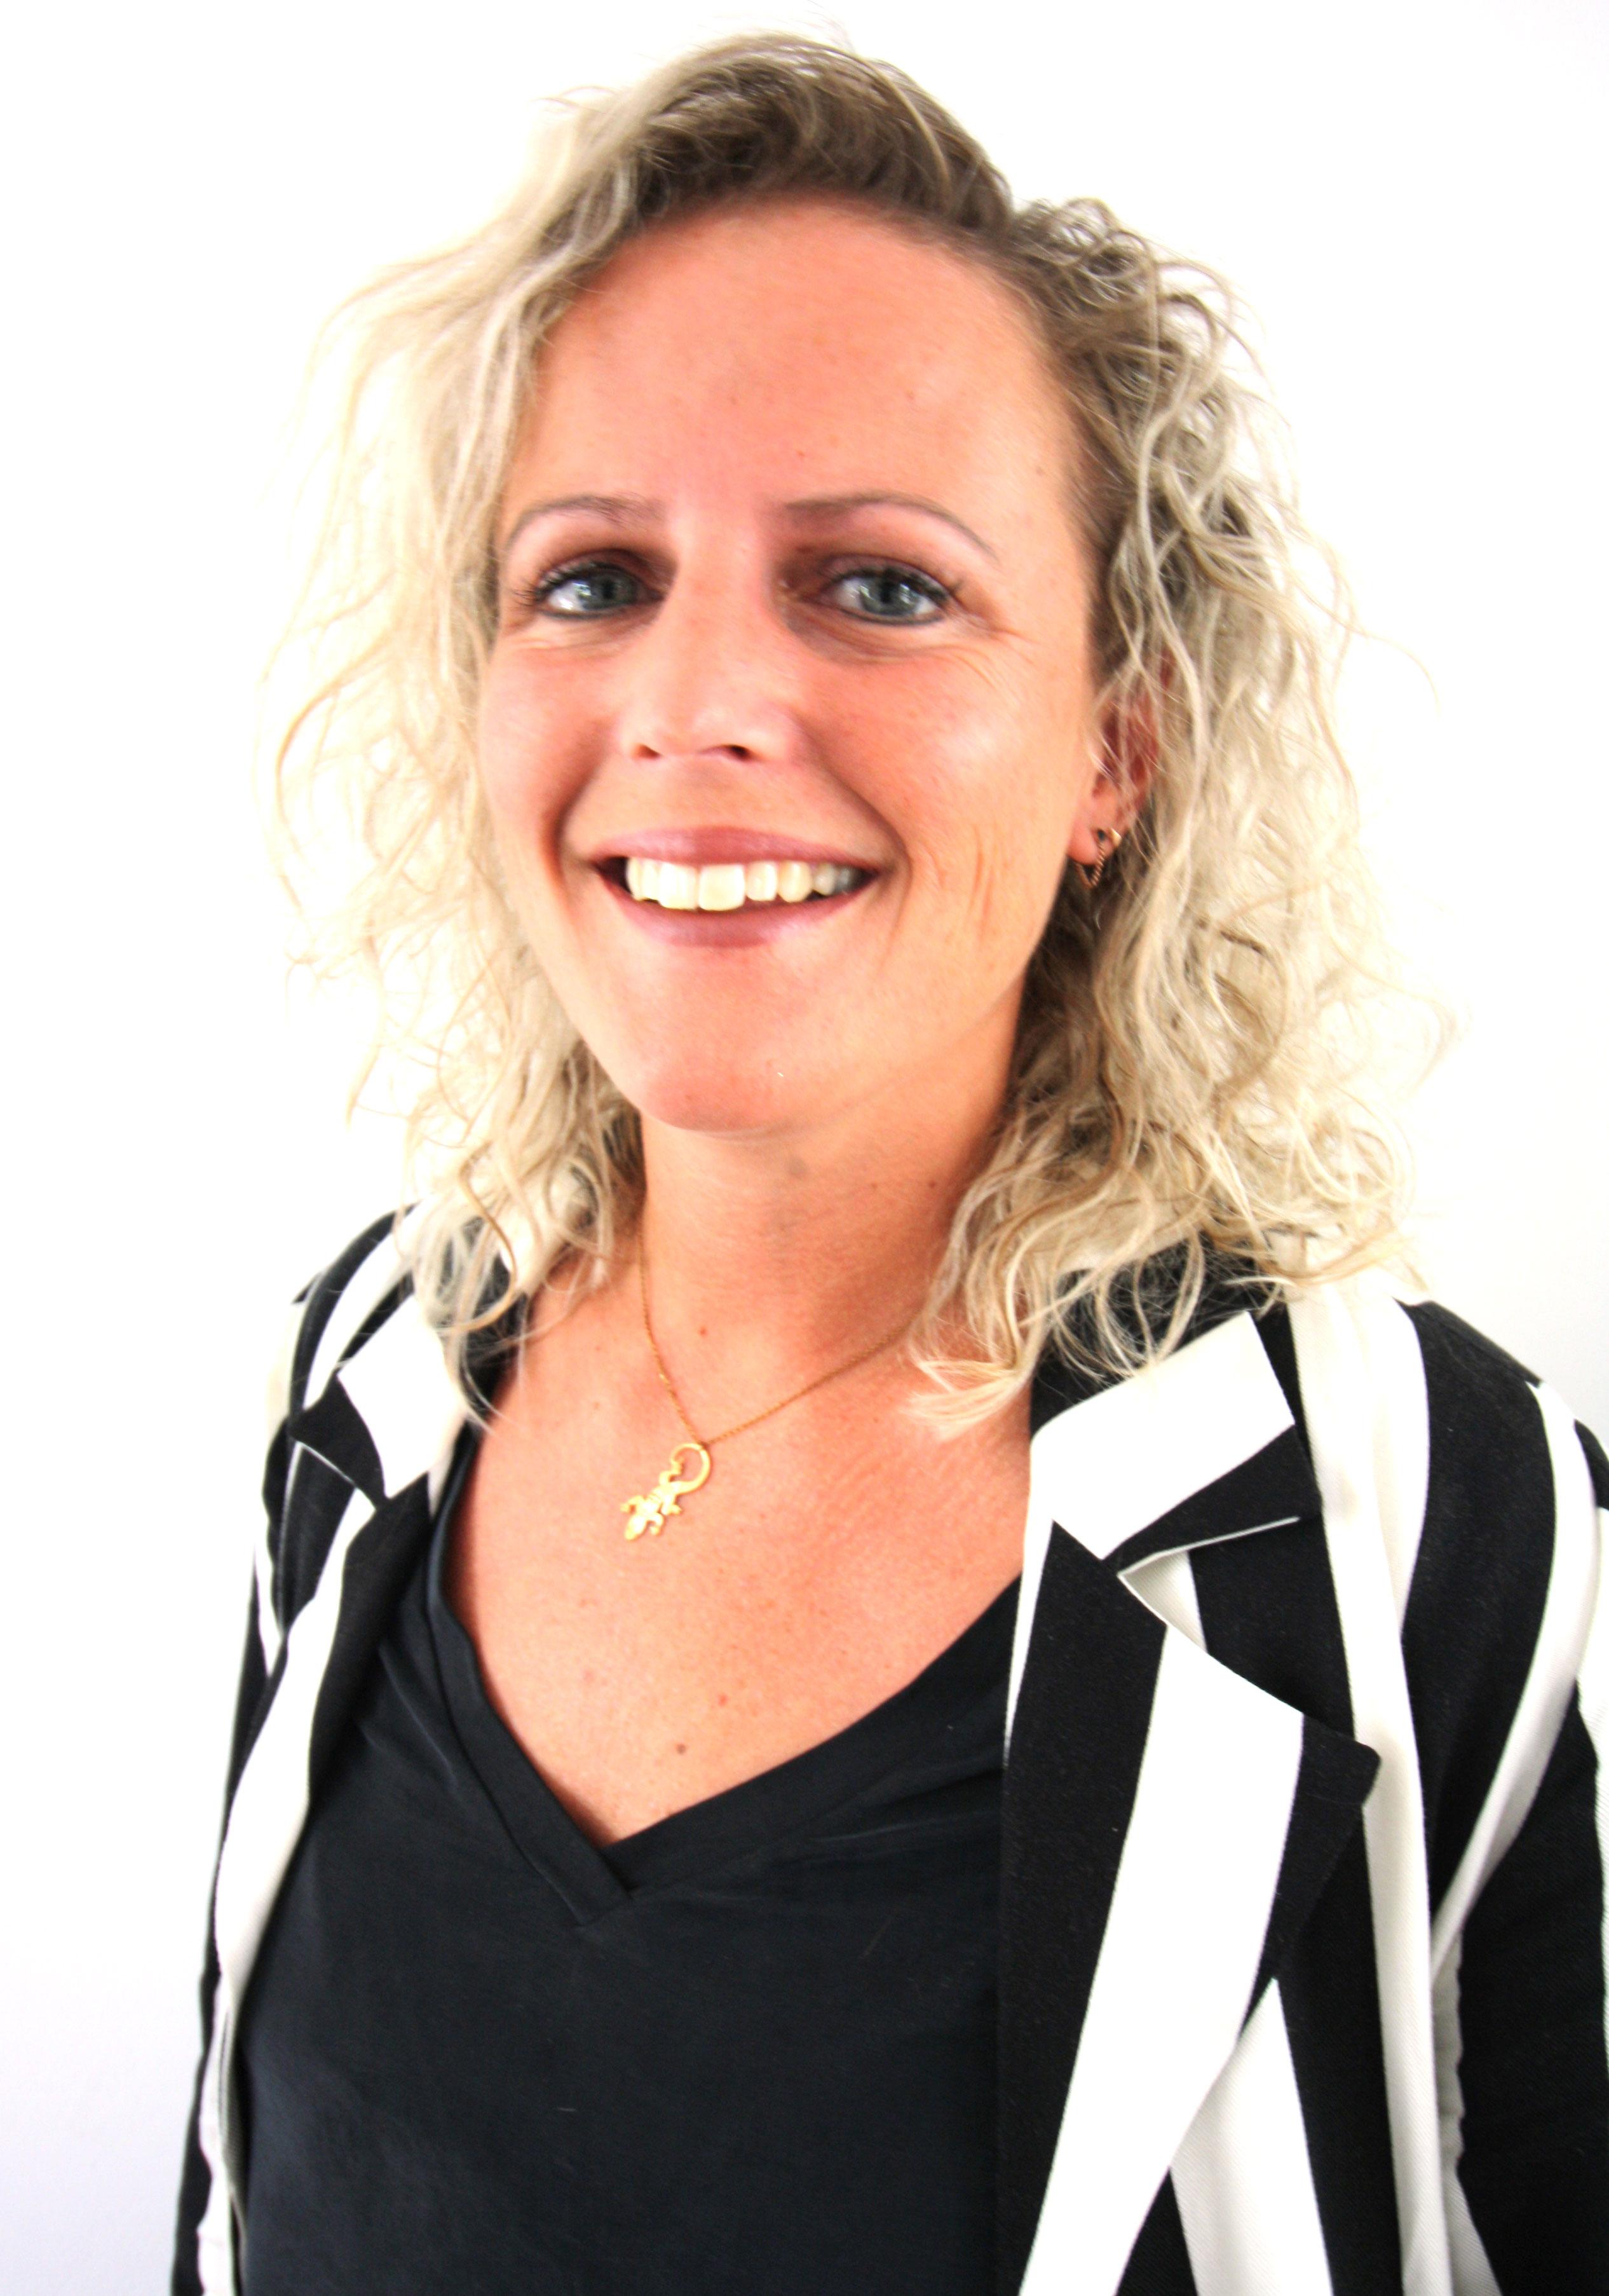 Cindy Huigen